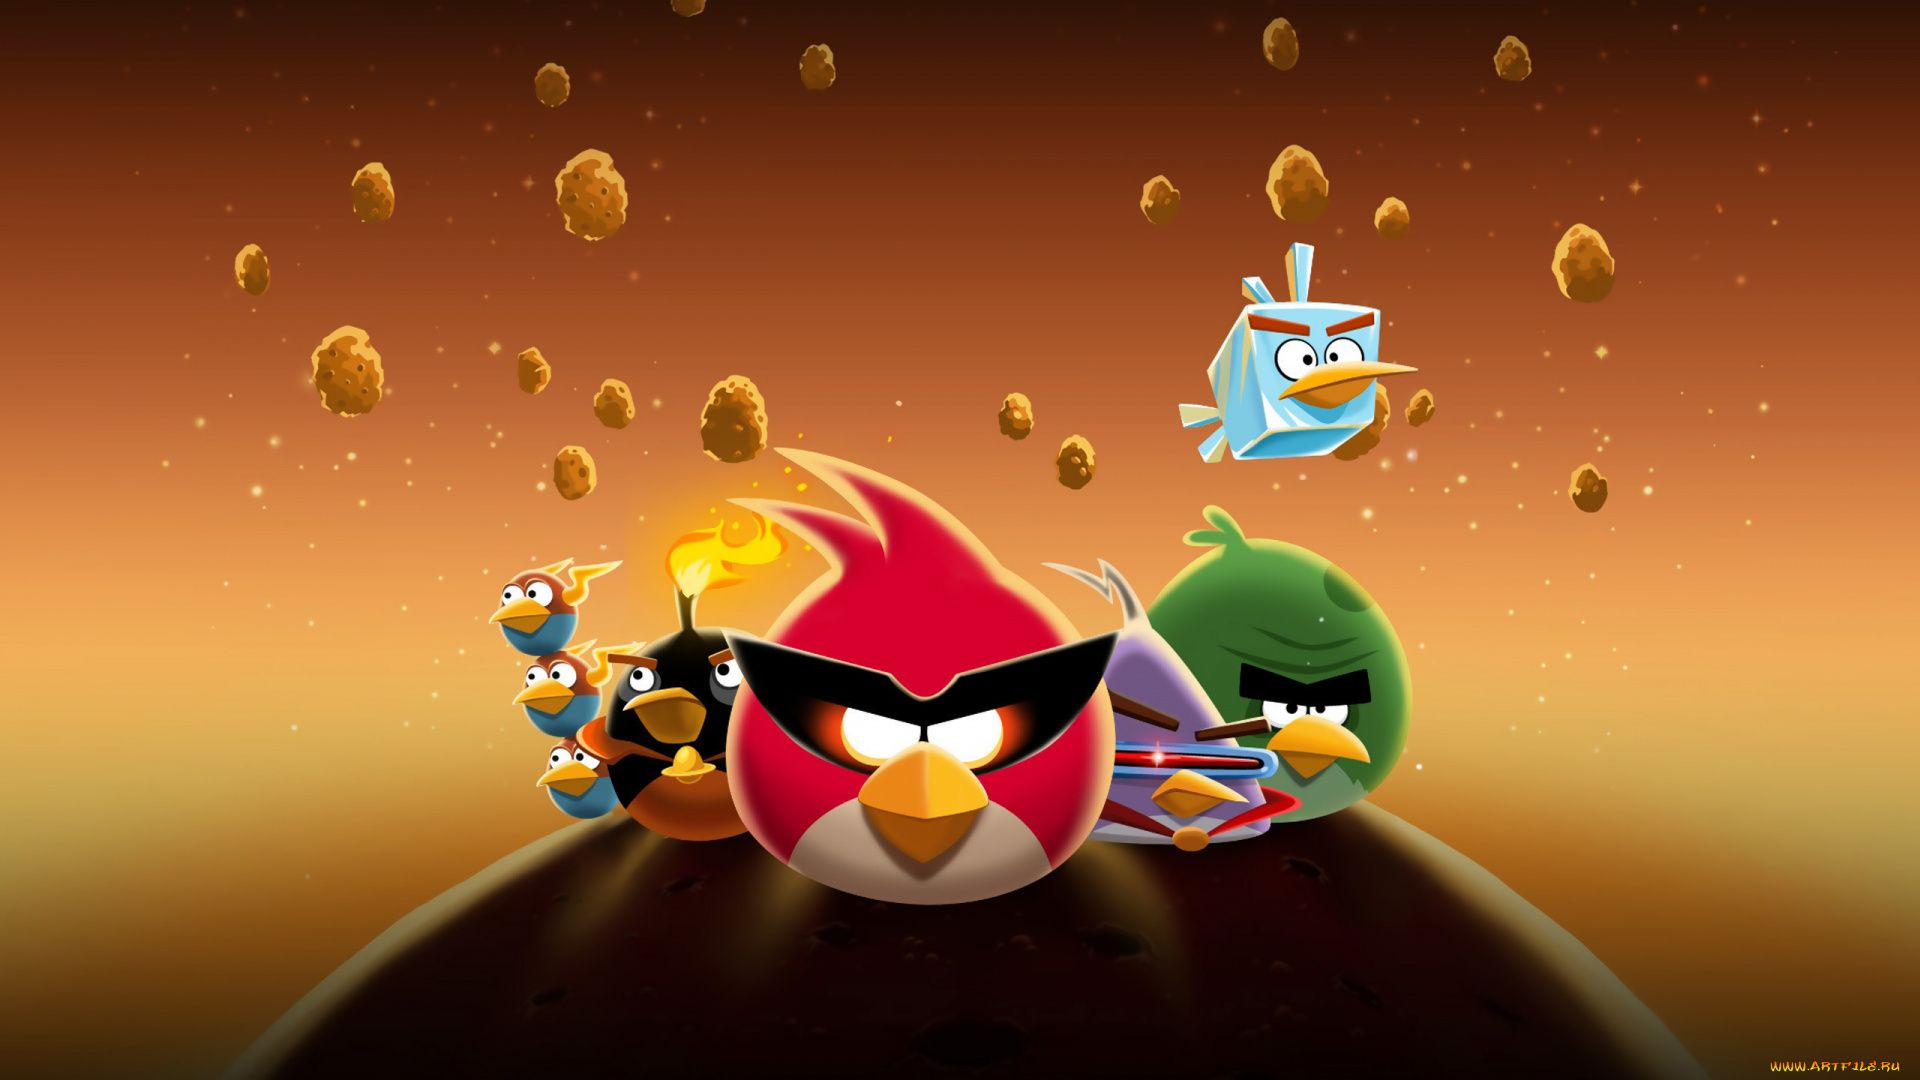 Photos Angry Birds Space